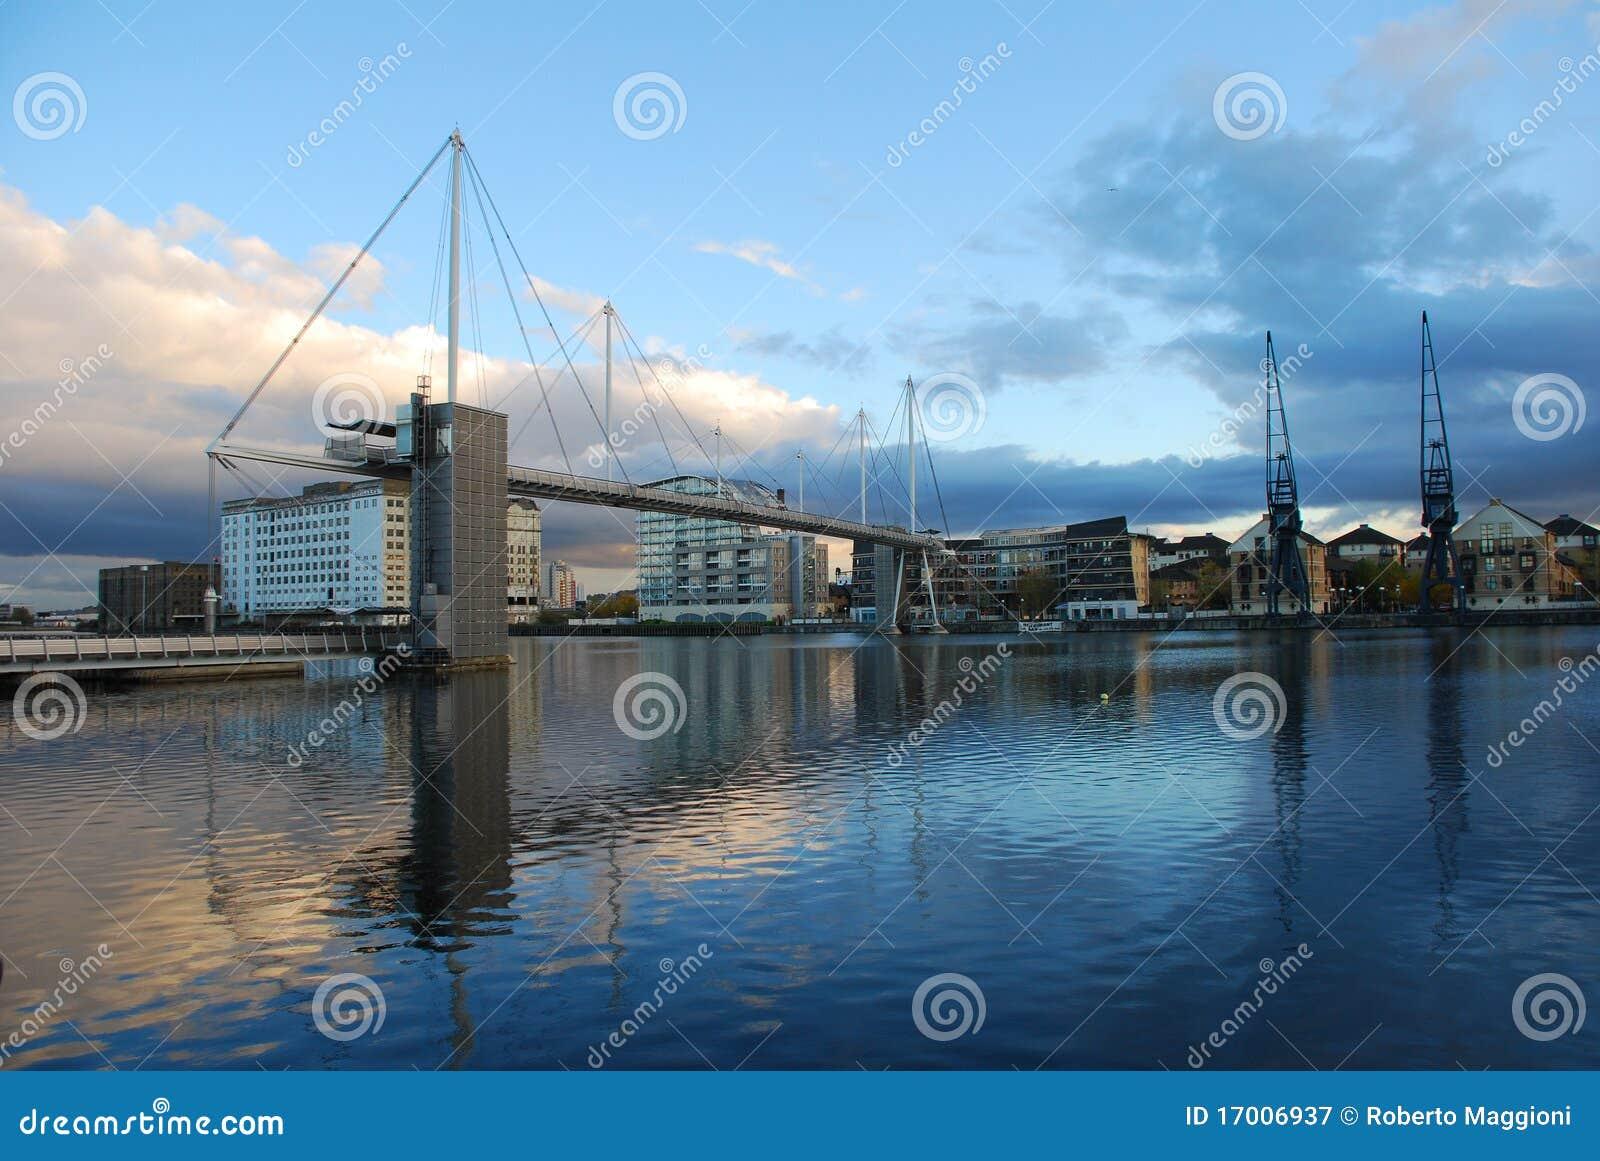 Royal Victoria Dock Bridge London Docklands Stock Image